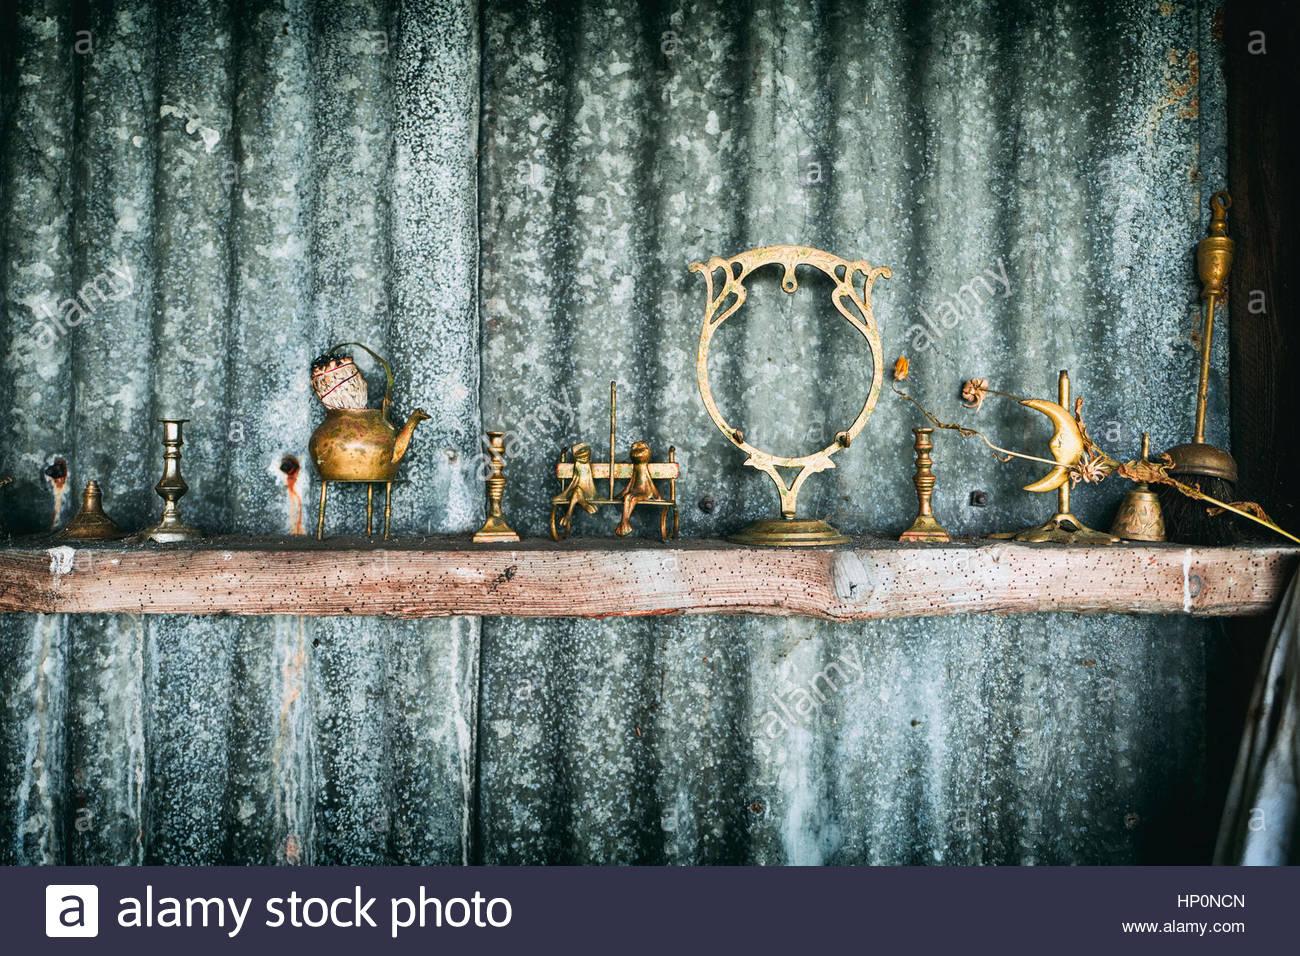 alte hütte rost wellblech messing ornamente regal stockfoto, bild